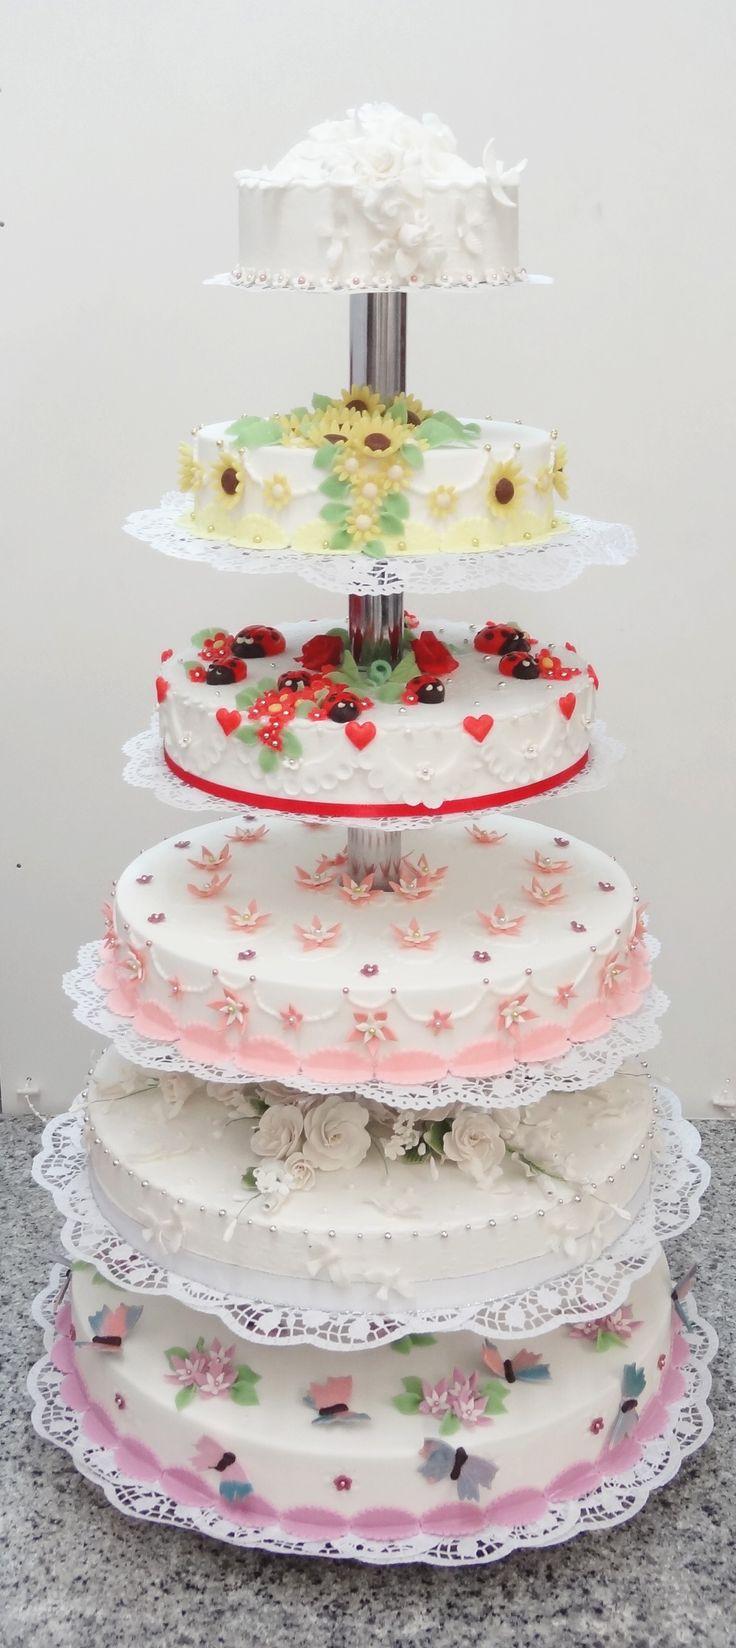 storey cake 6 storey café riese cakes 11 cake hand cologne germany ...